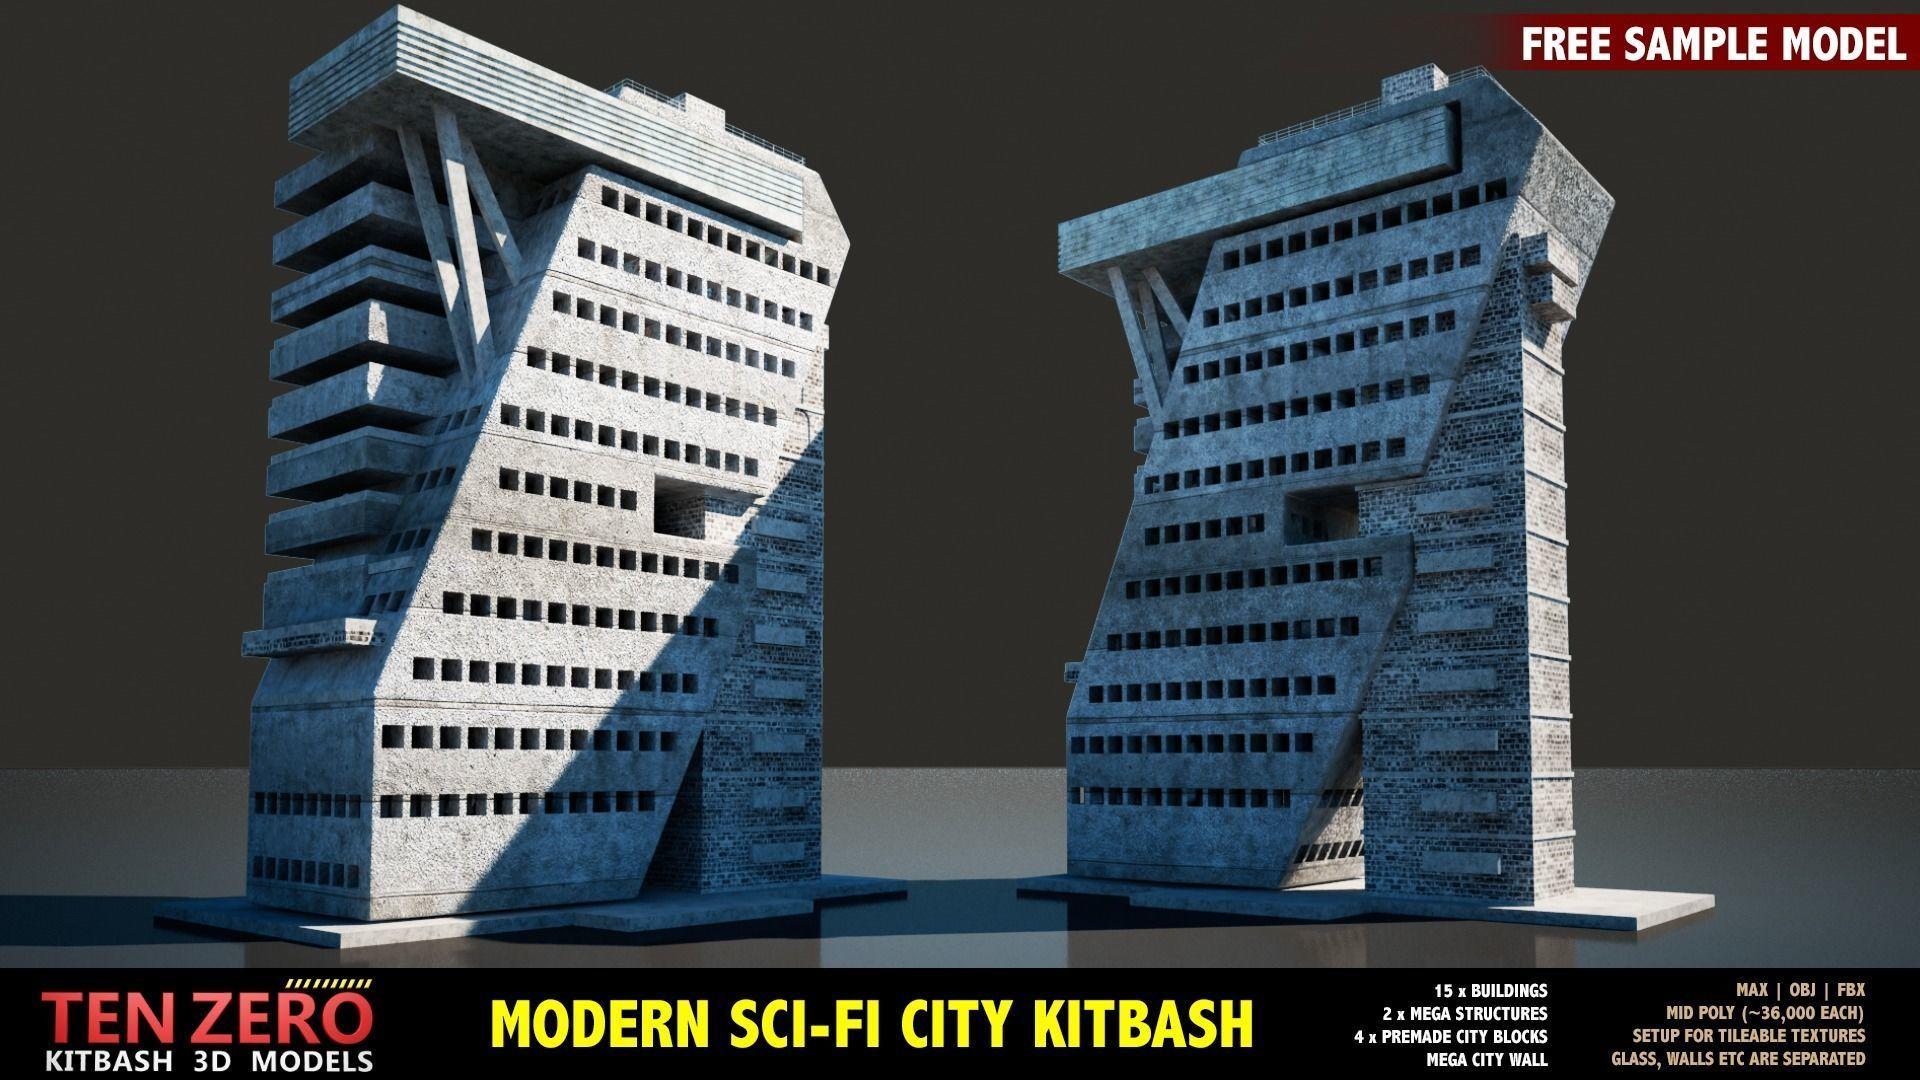 FREE MODERN SCI-FI BUILDING